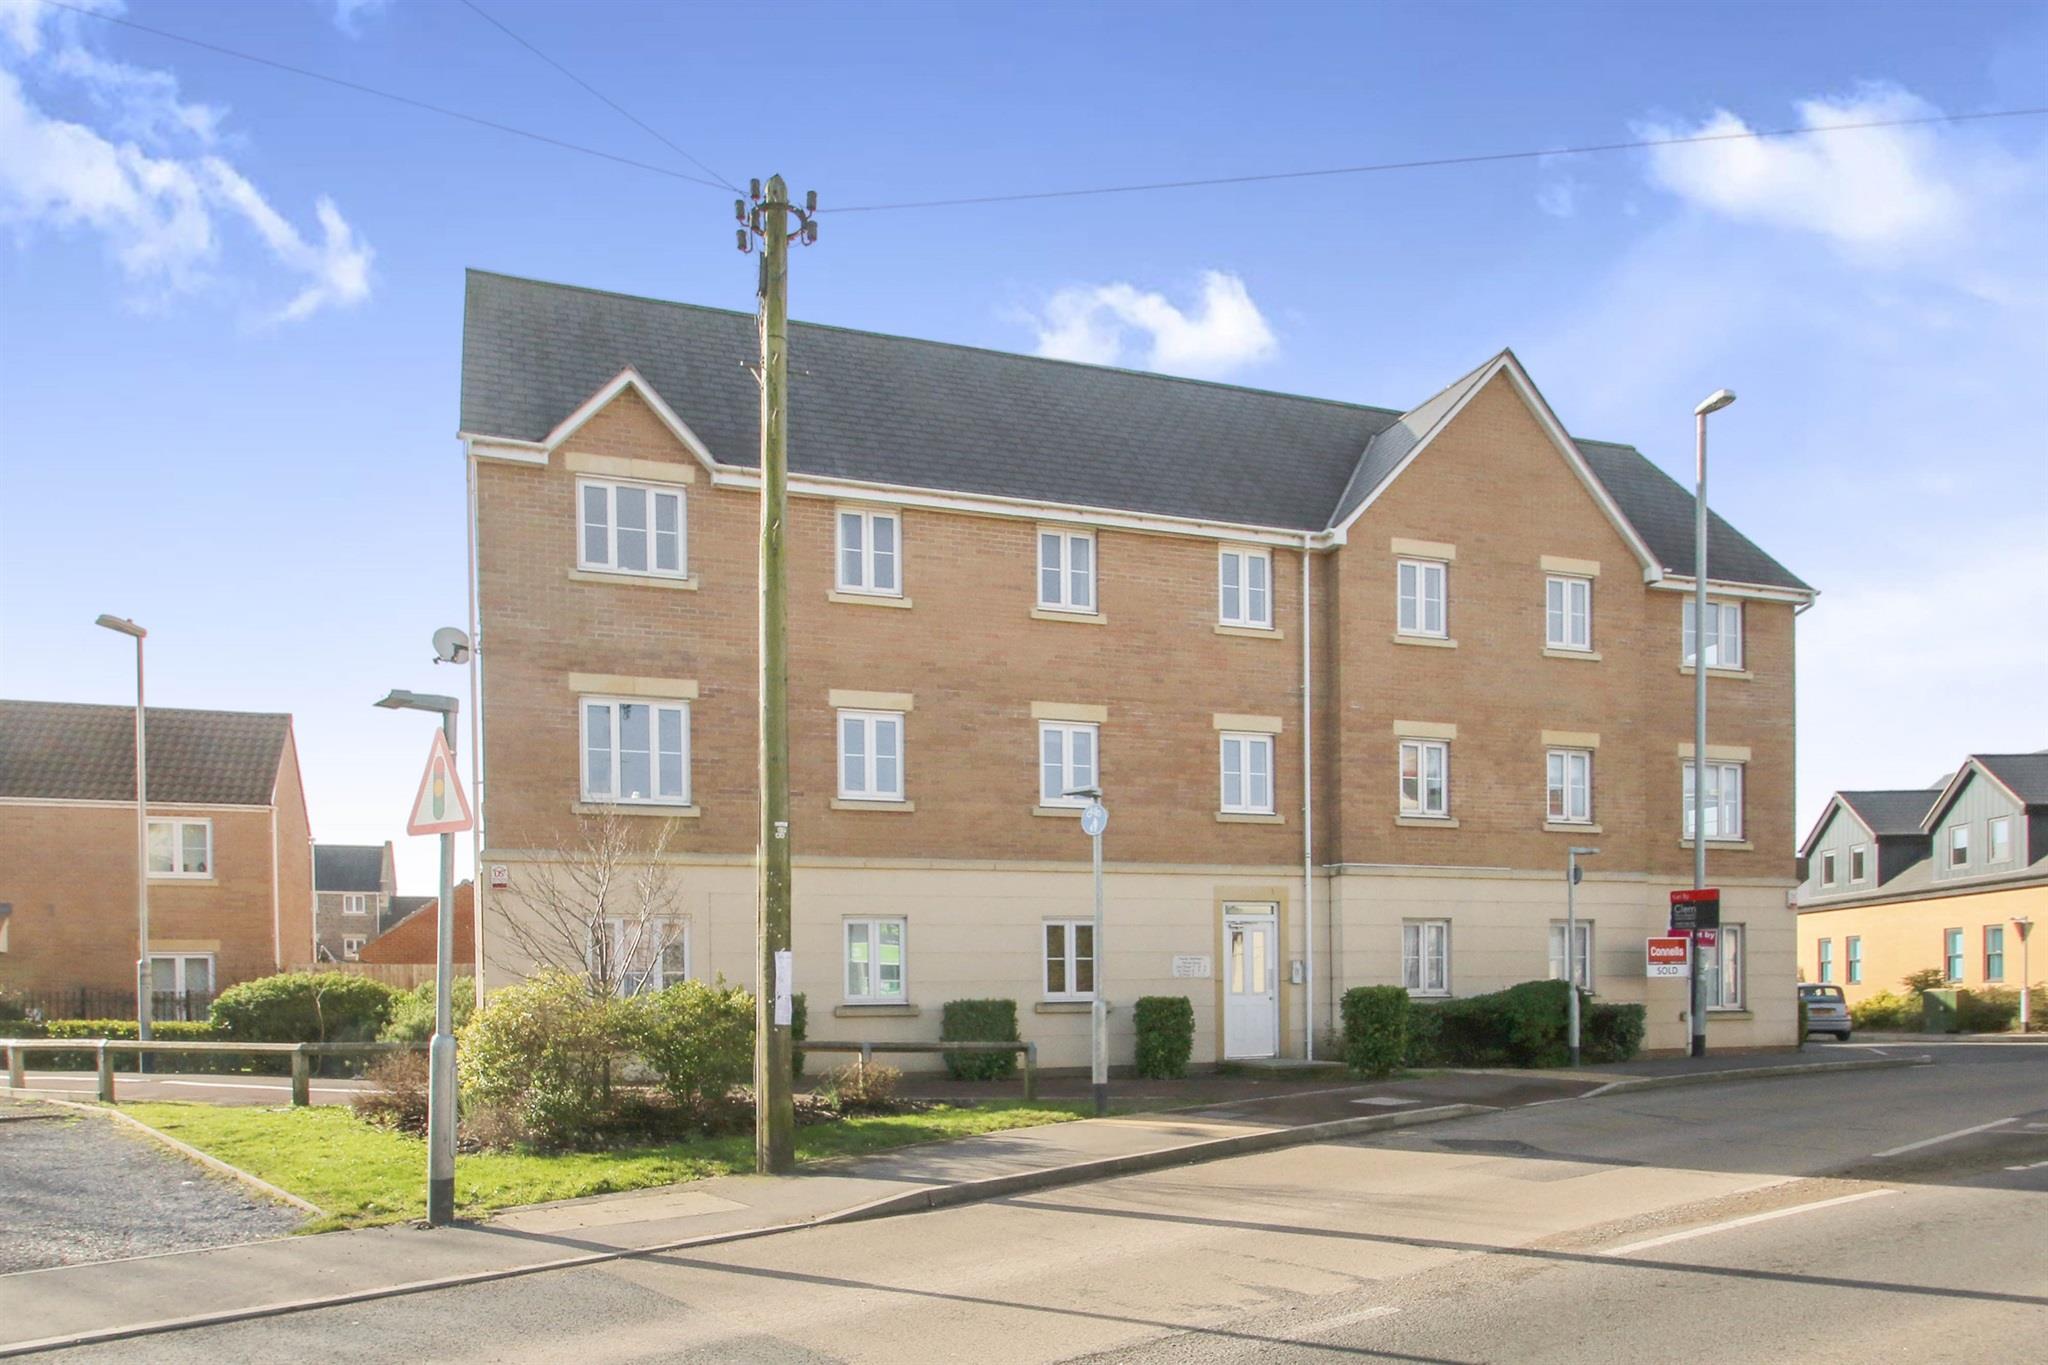 2 Bedroom Apartment For Sale Morse Road Taunton Ta2 6bu